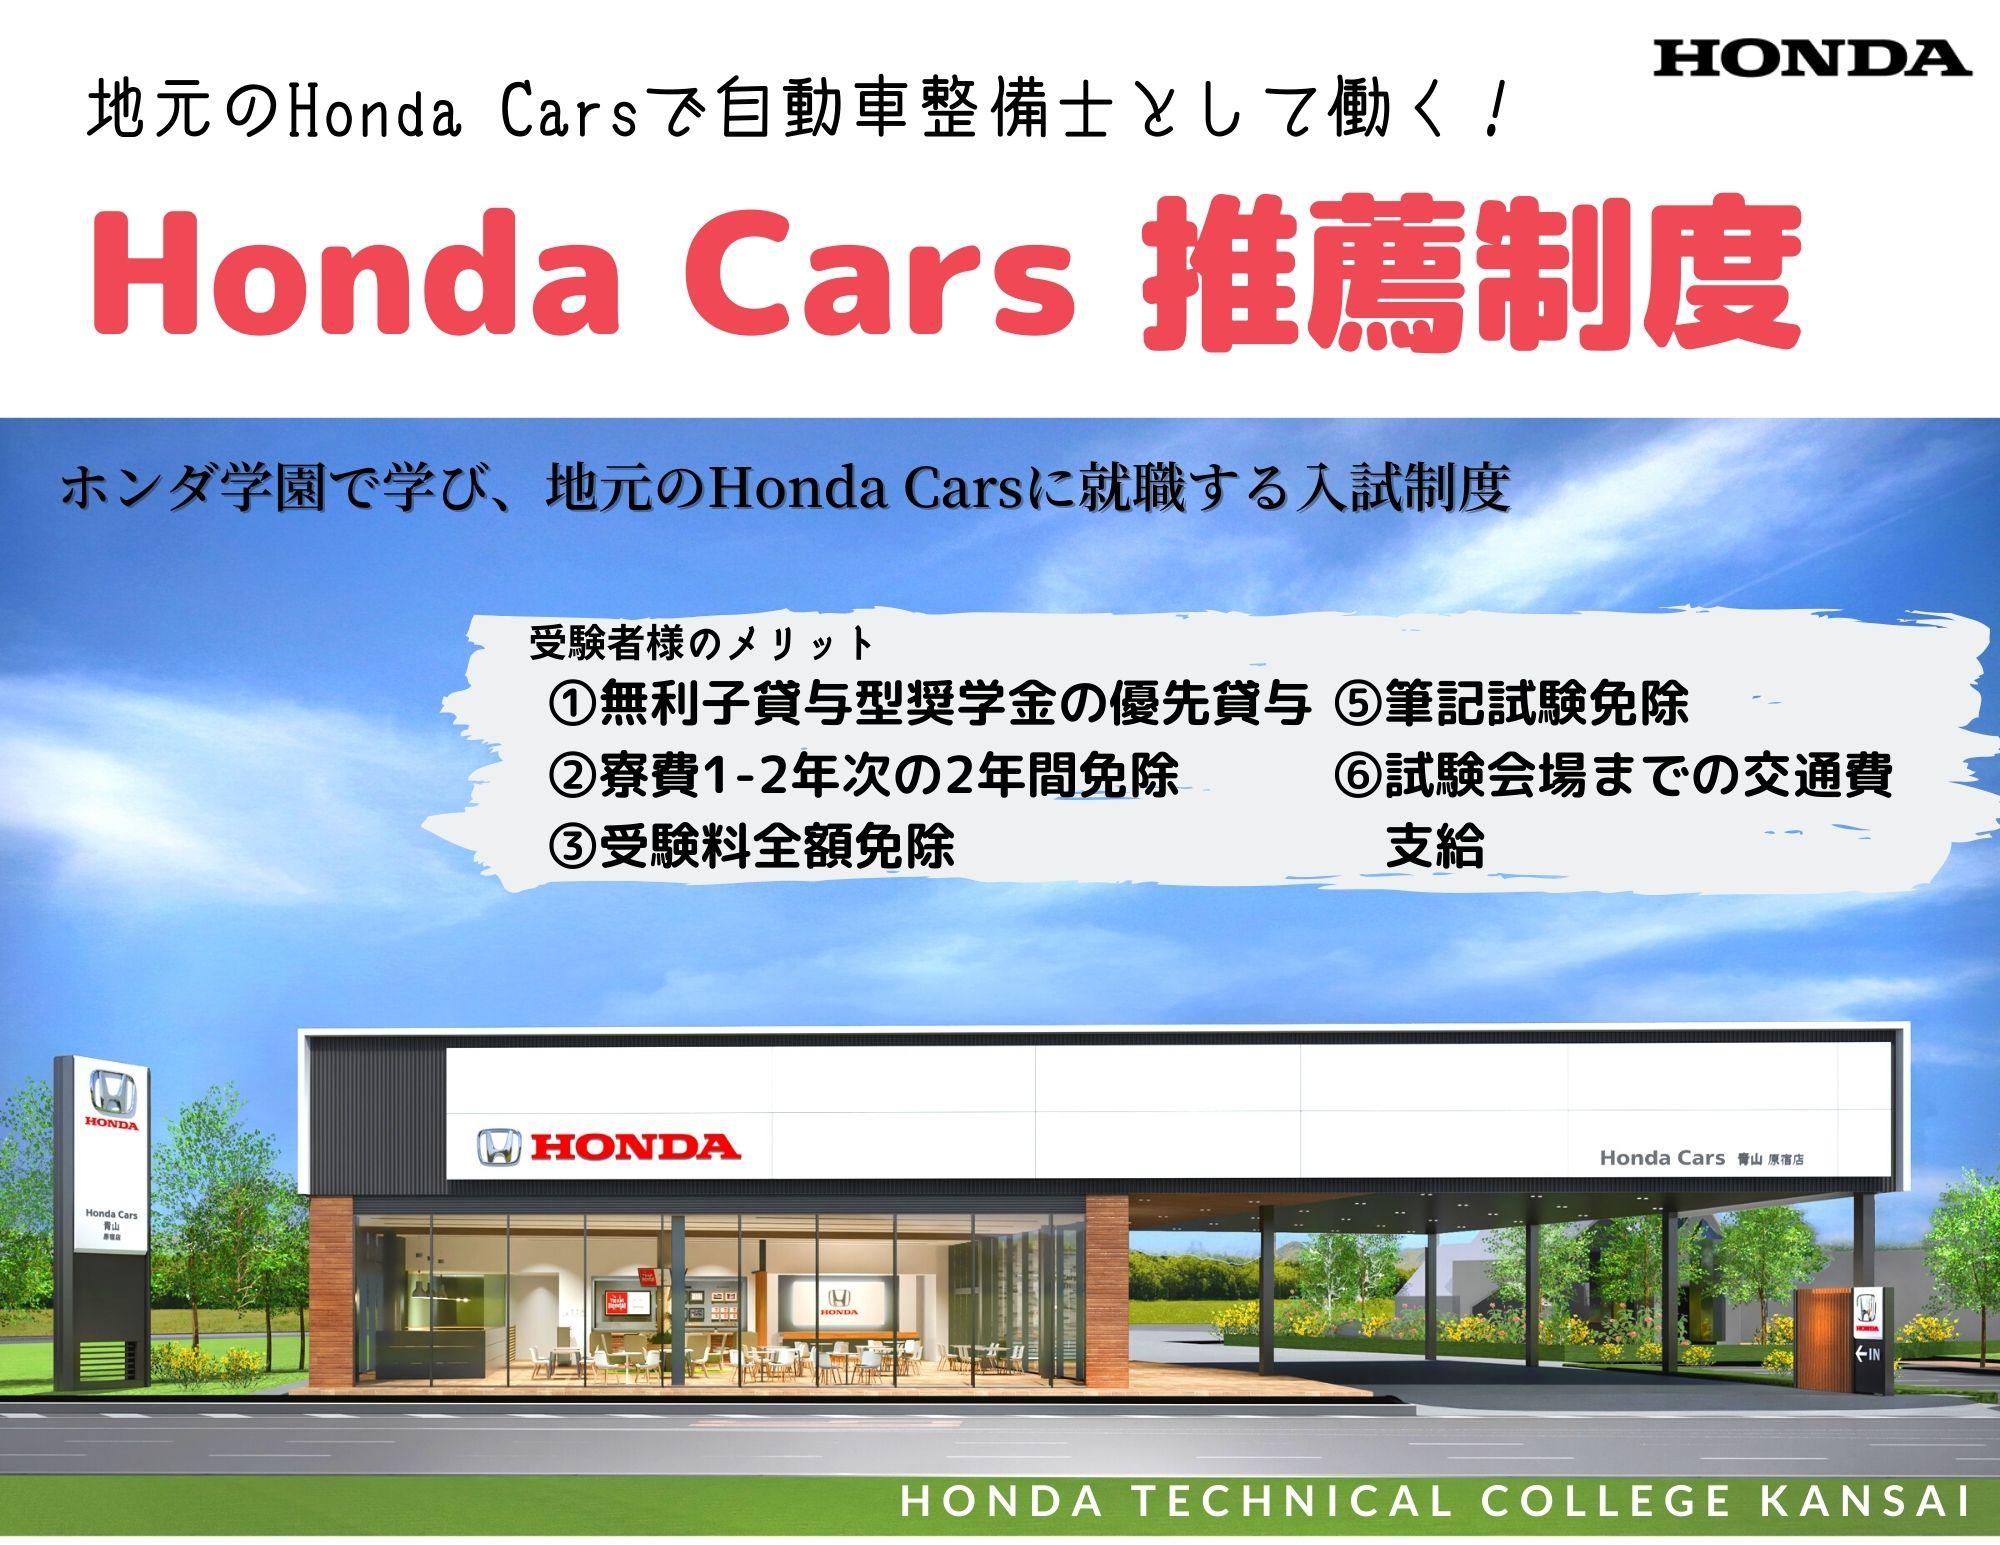 Honda Cars 推薦制度